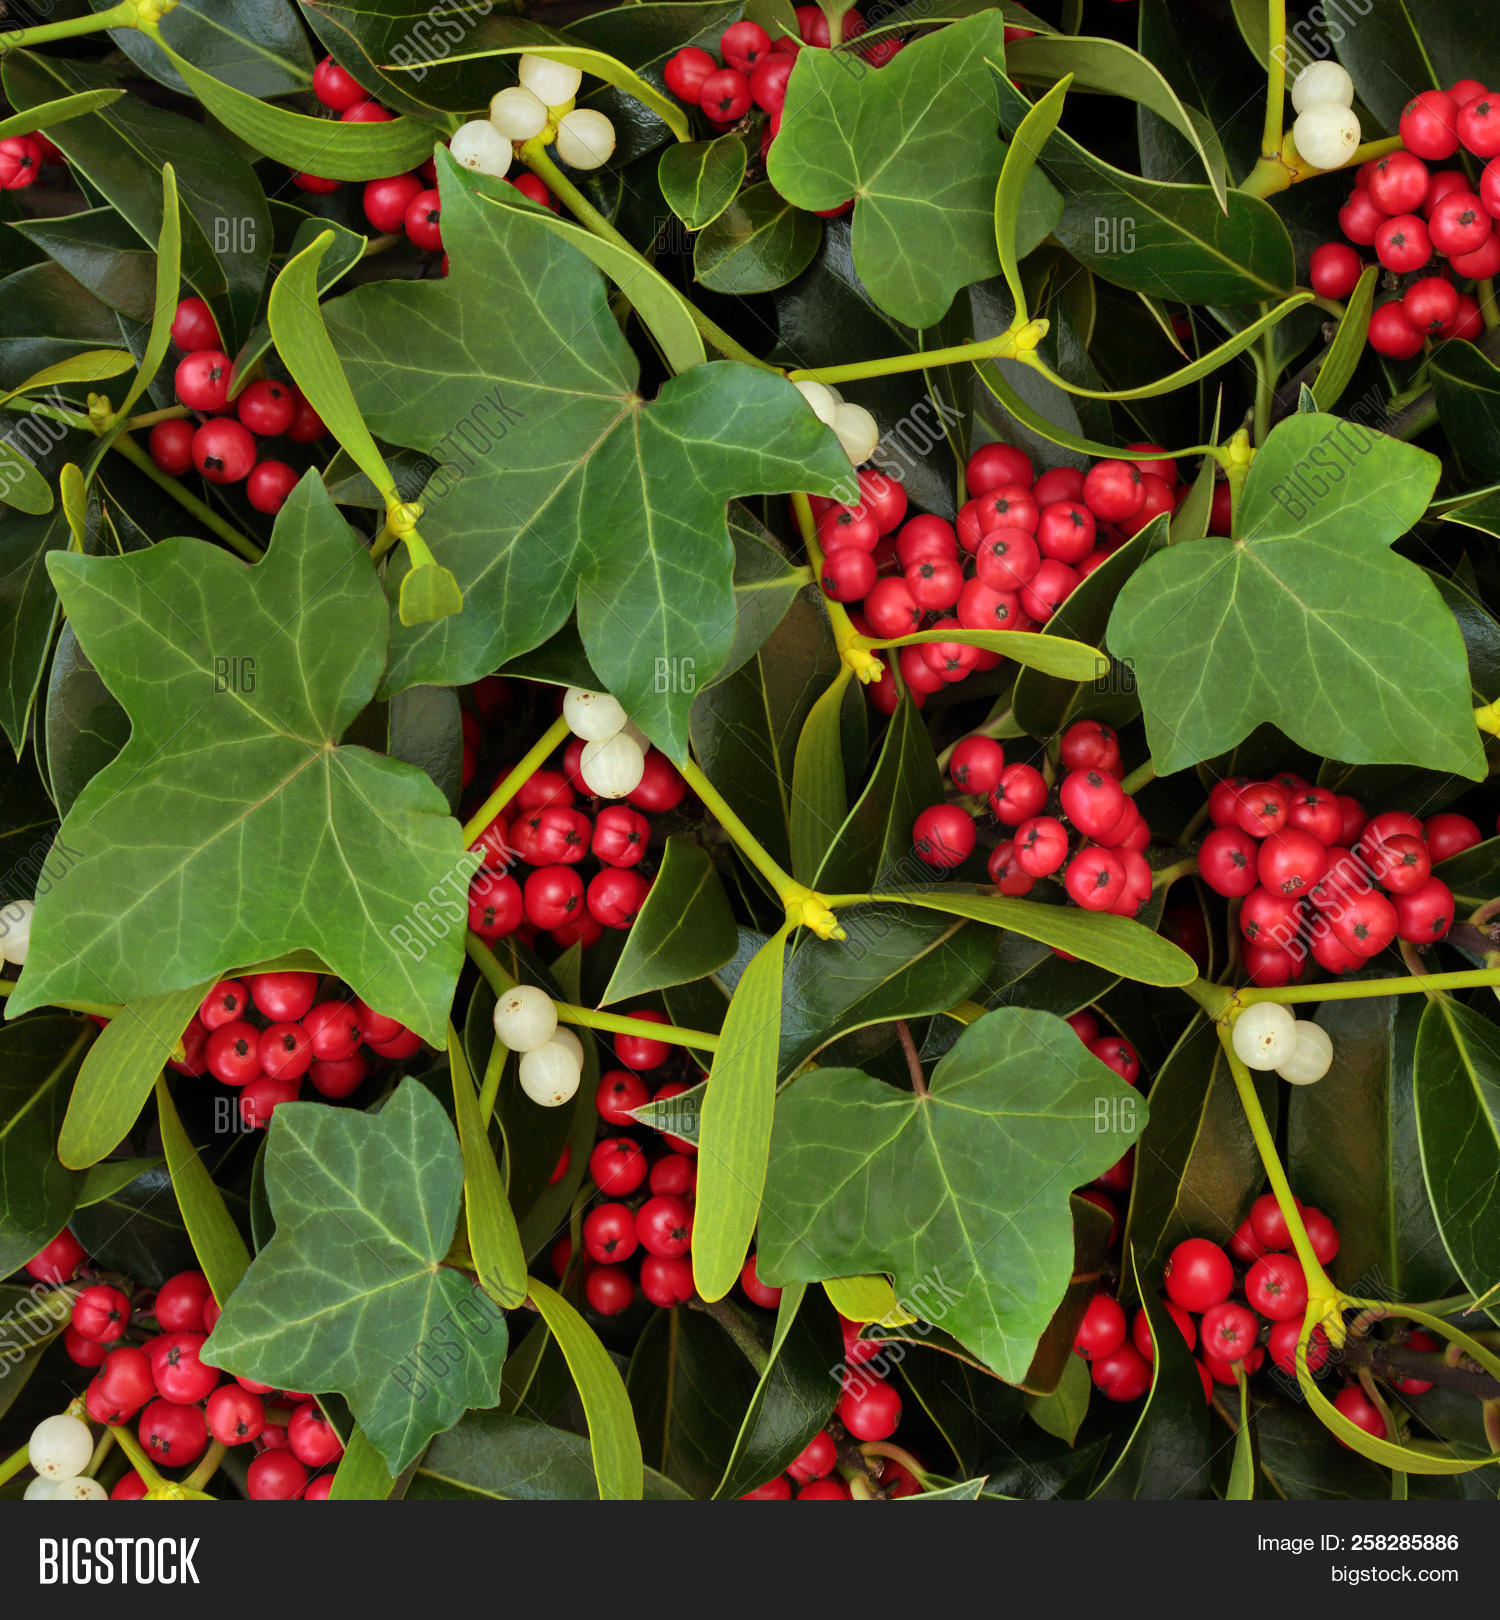 Mistletoe And Ivy